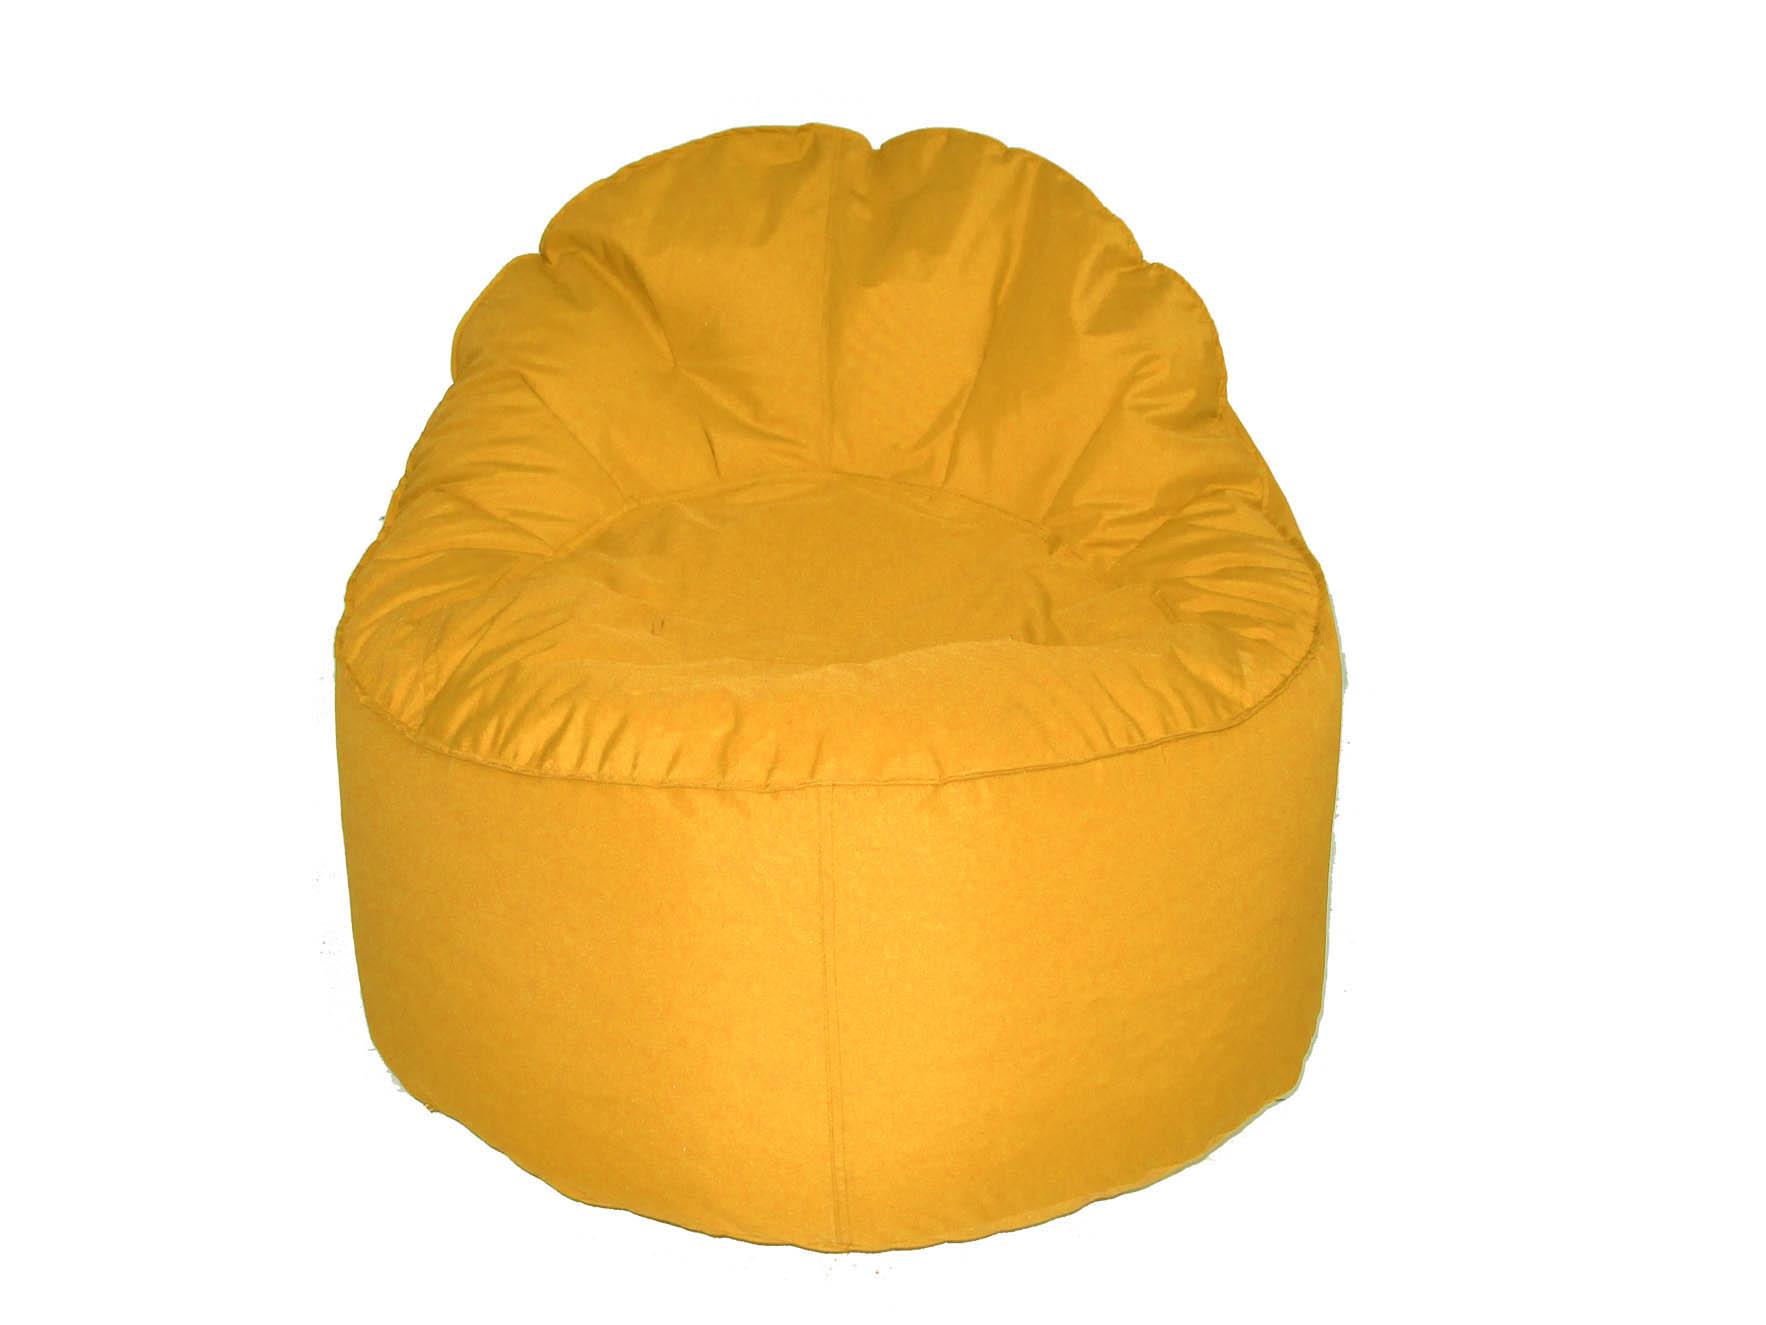 Knot - Pouf jaune - Habitat